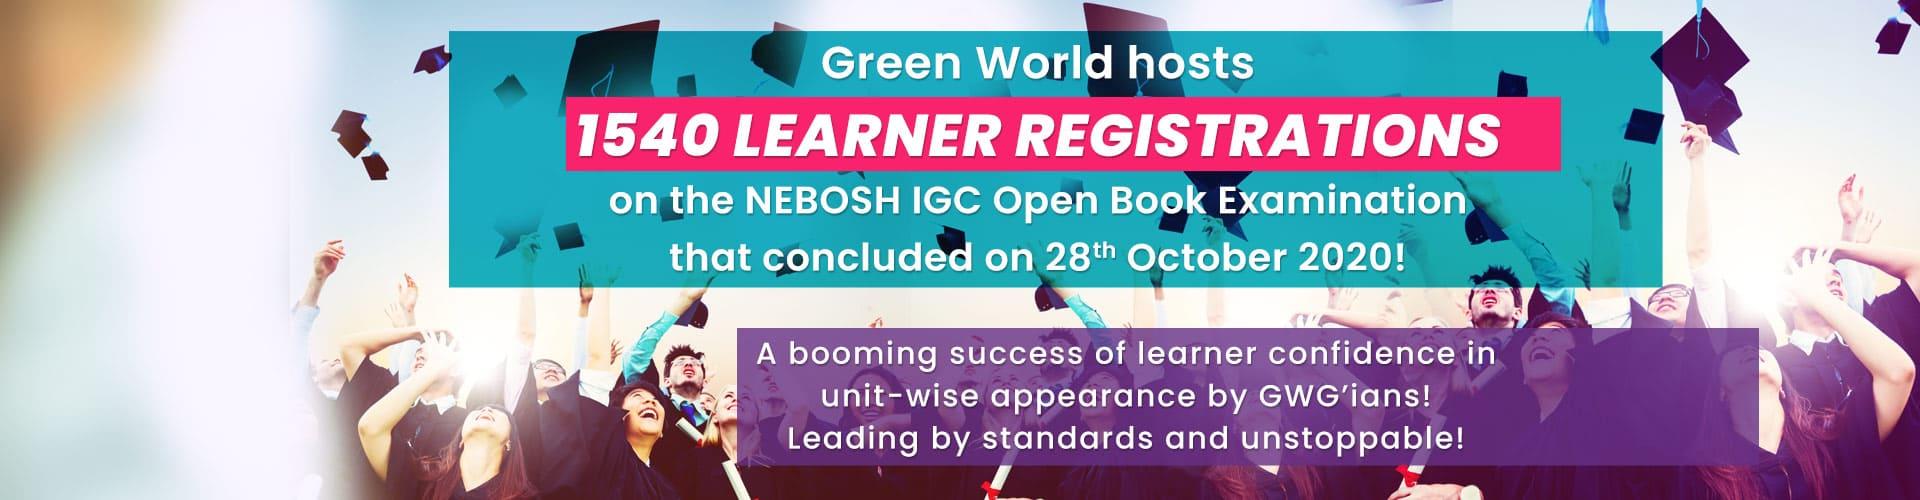 NEBOSH_IGC_1540_learner-registrations_Banner_2020_coin